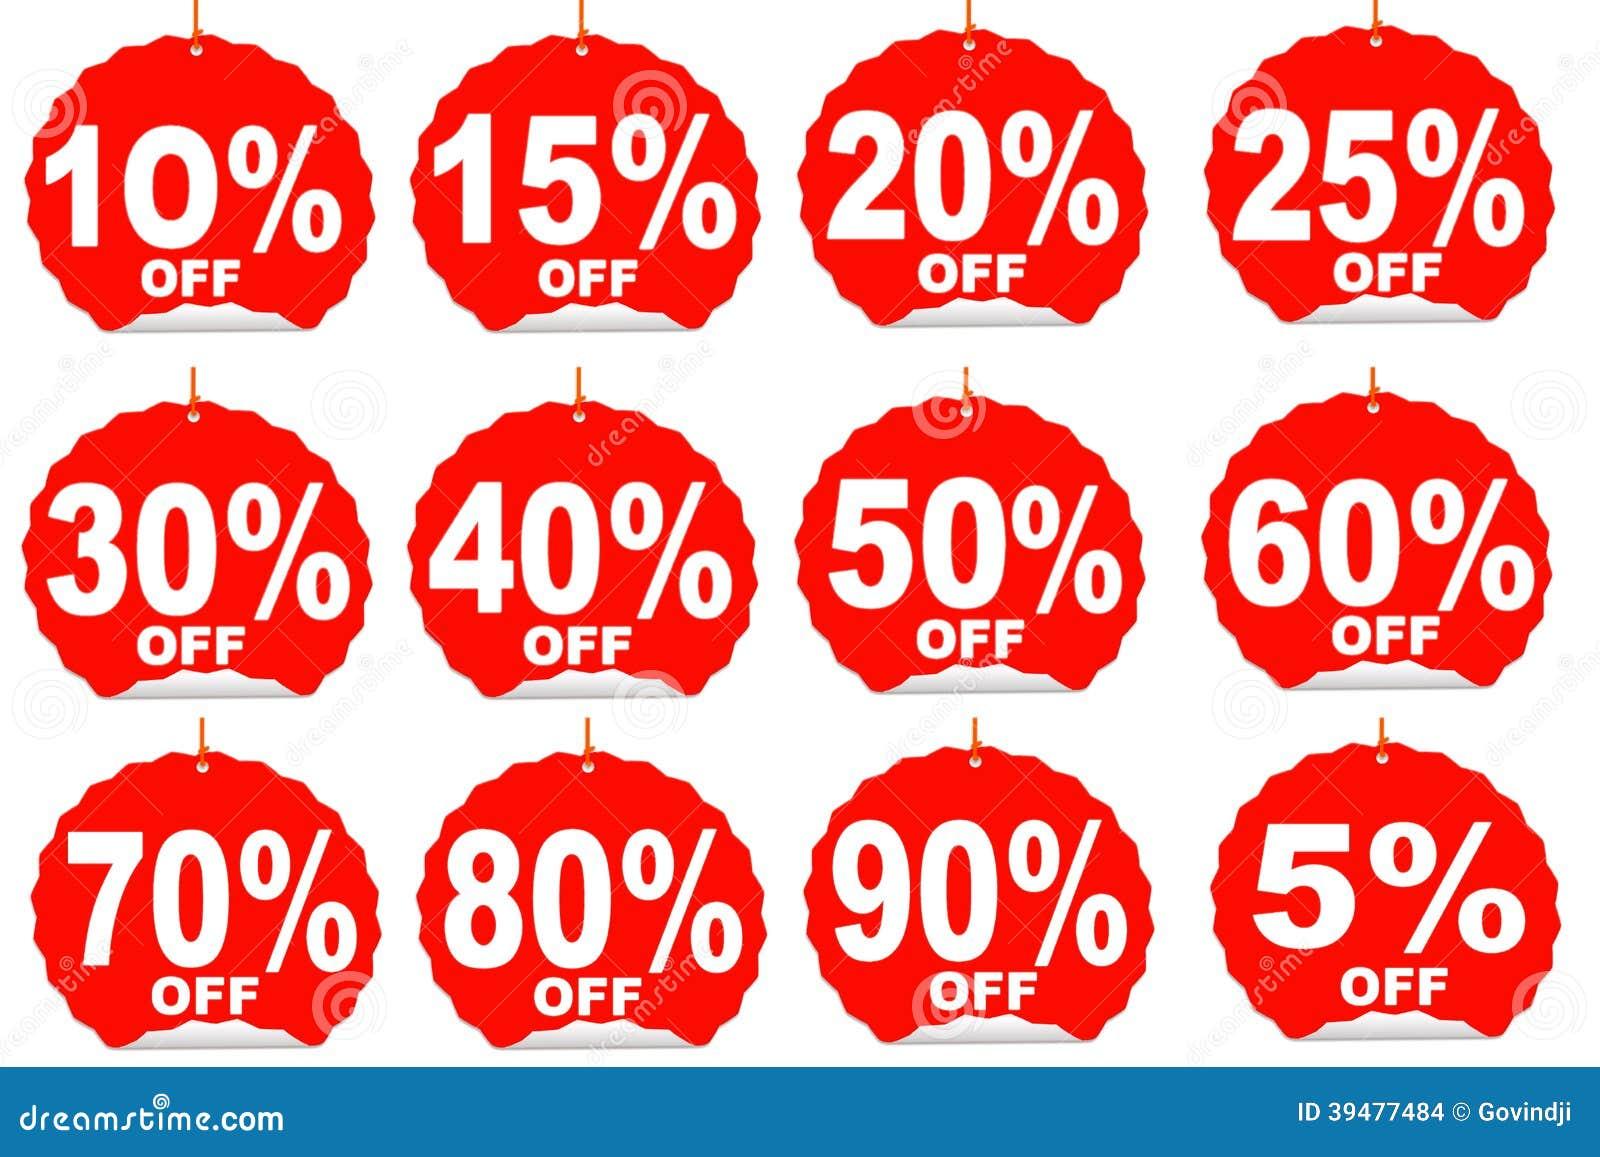 LAMKIN SONAR+ WRAP CALIBRATE GRIP | Discount Prices for